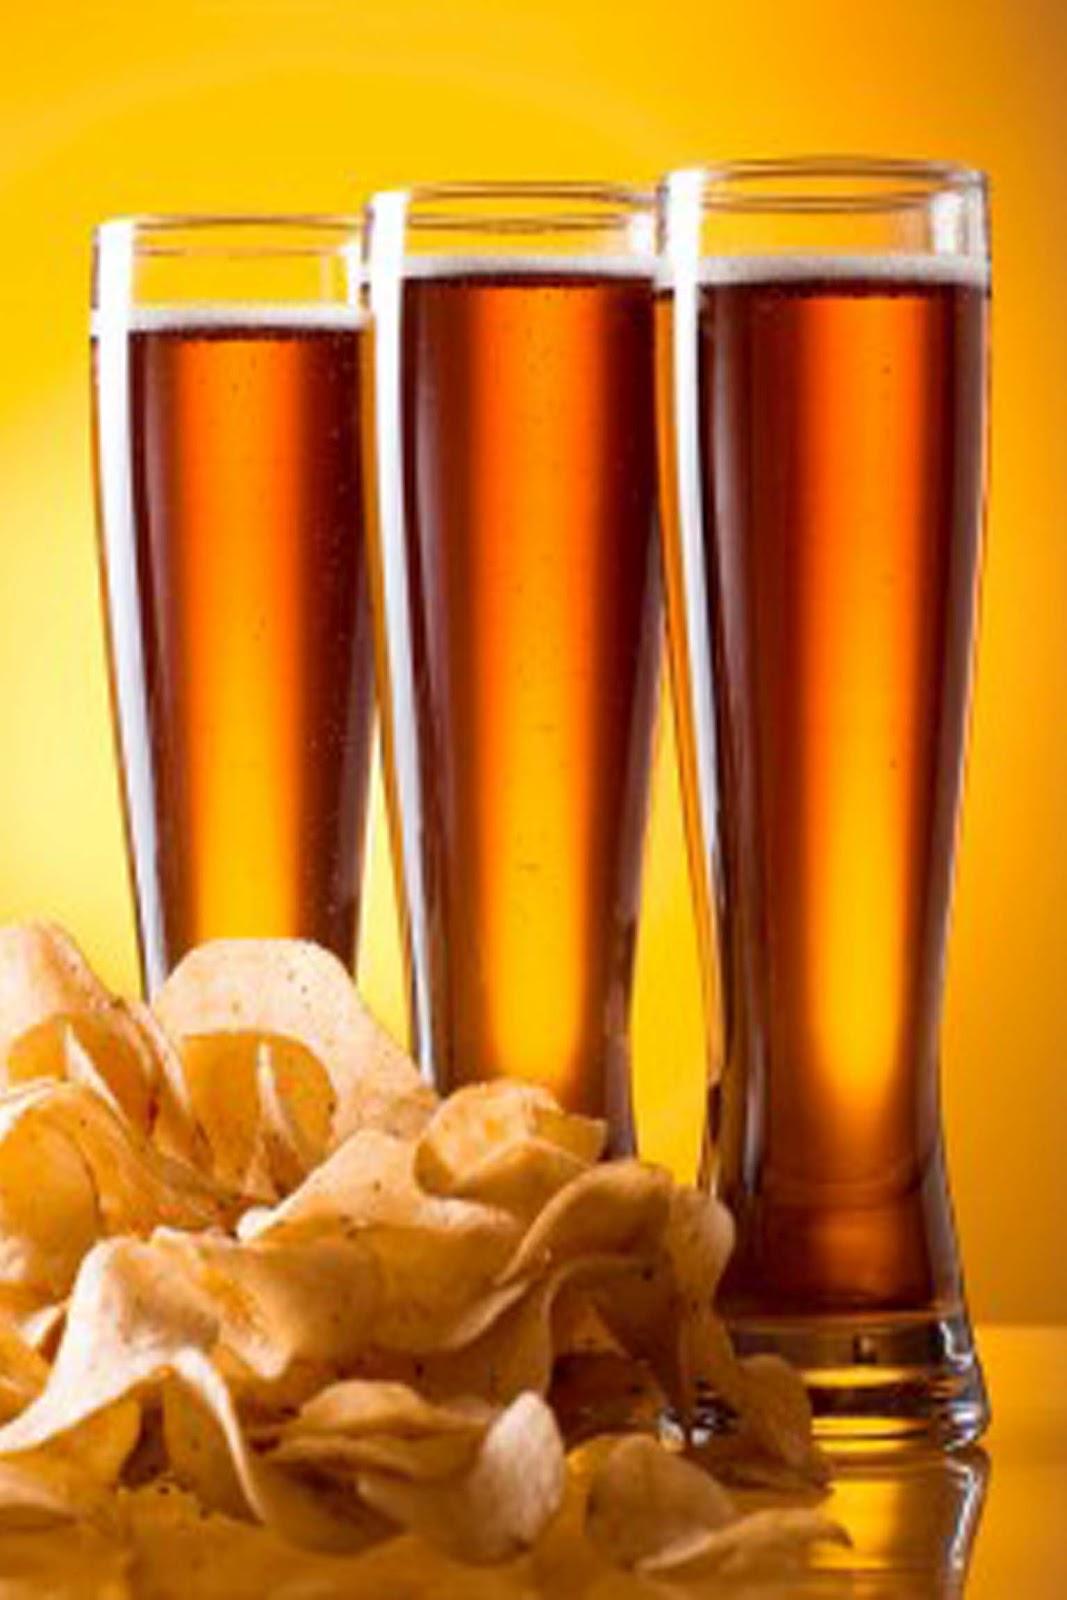 Fotos de vasos de cerveza 24